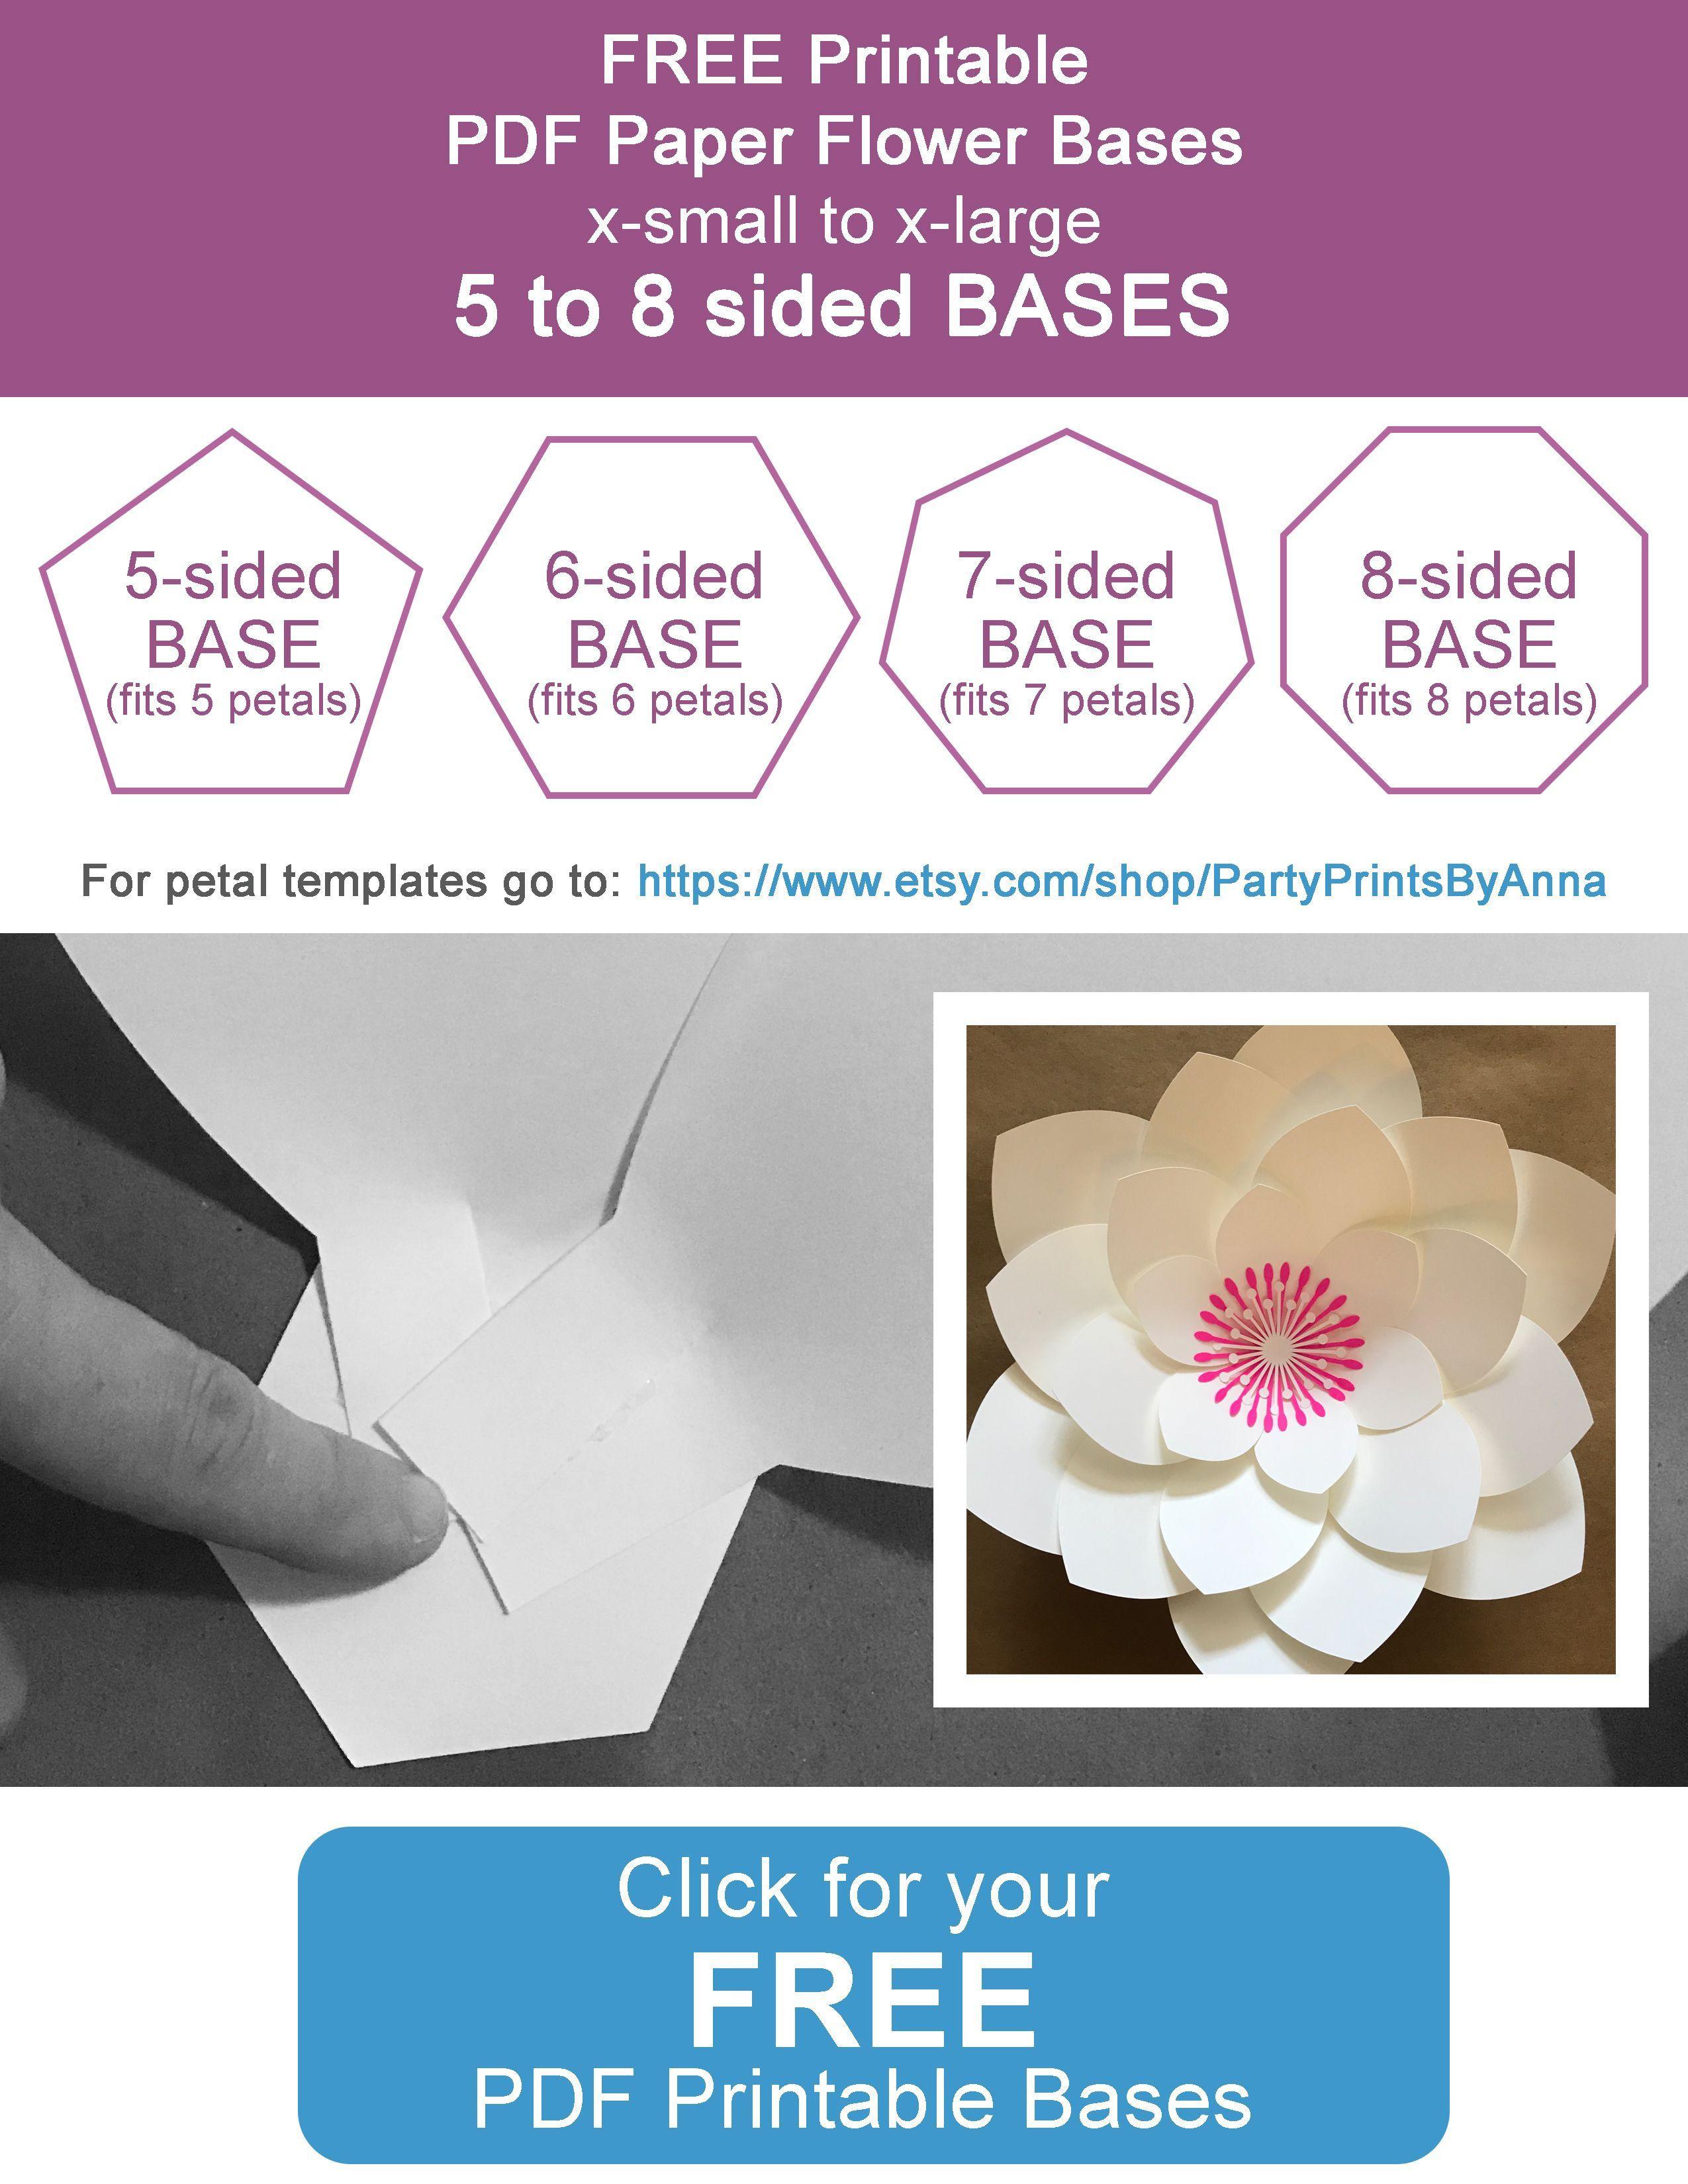 004 Striking Free Printable Diy Paper Flower Template Image  TemplatesFull